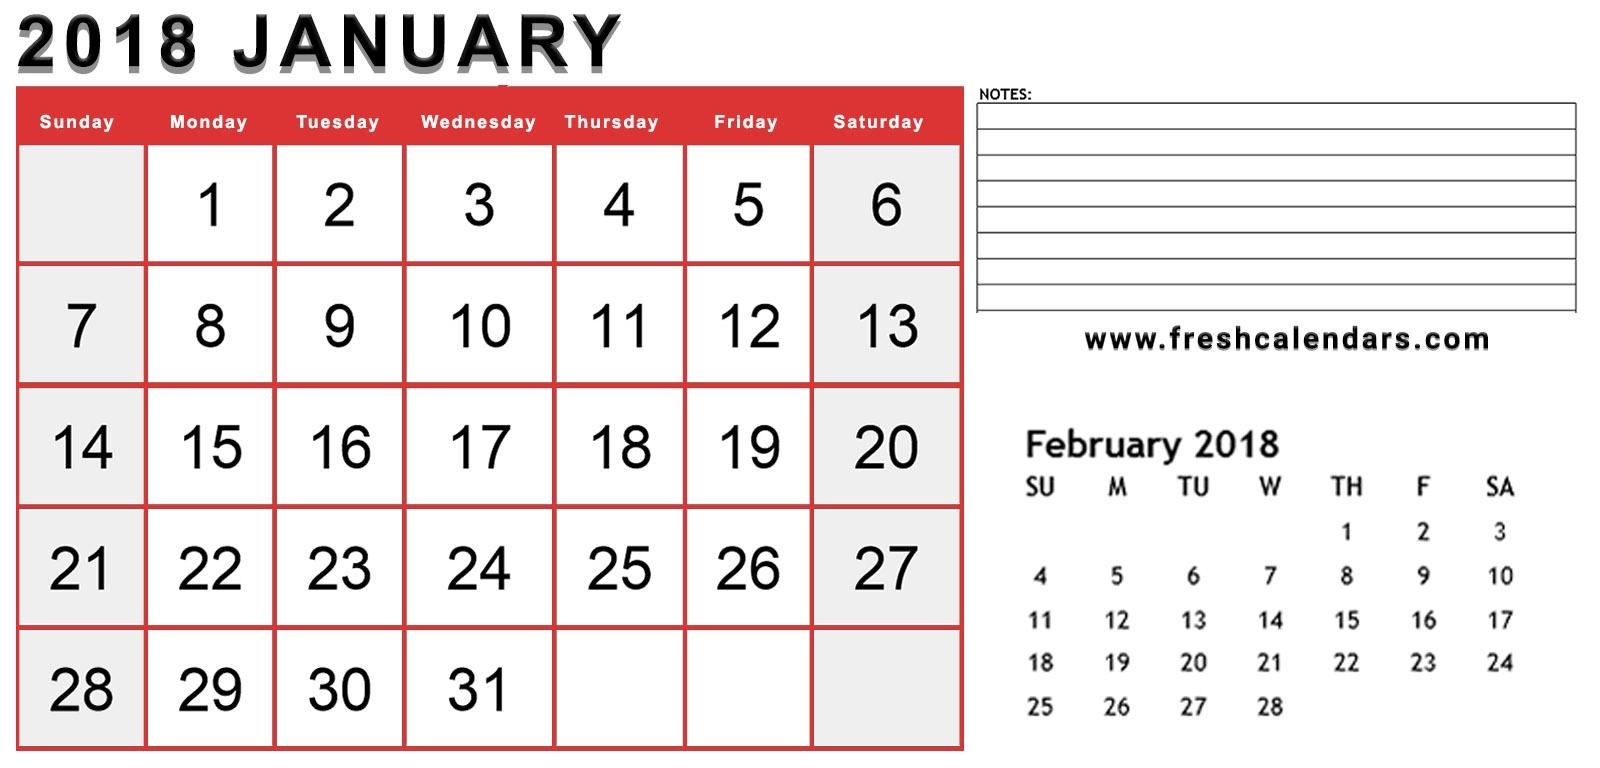 January 2018 Calendar Printable - Fresh Calendars inside Calendar With The Months Number